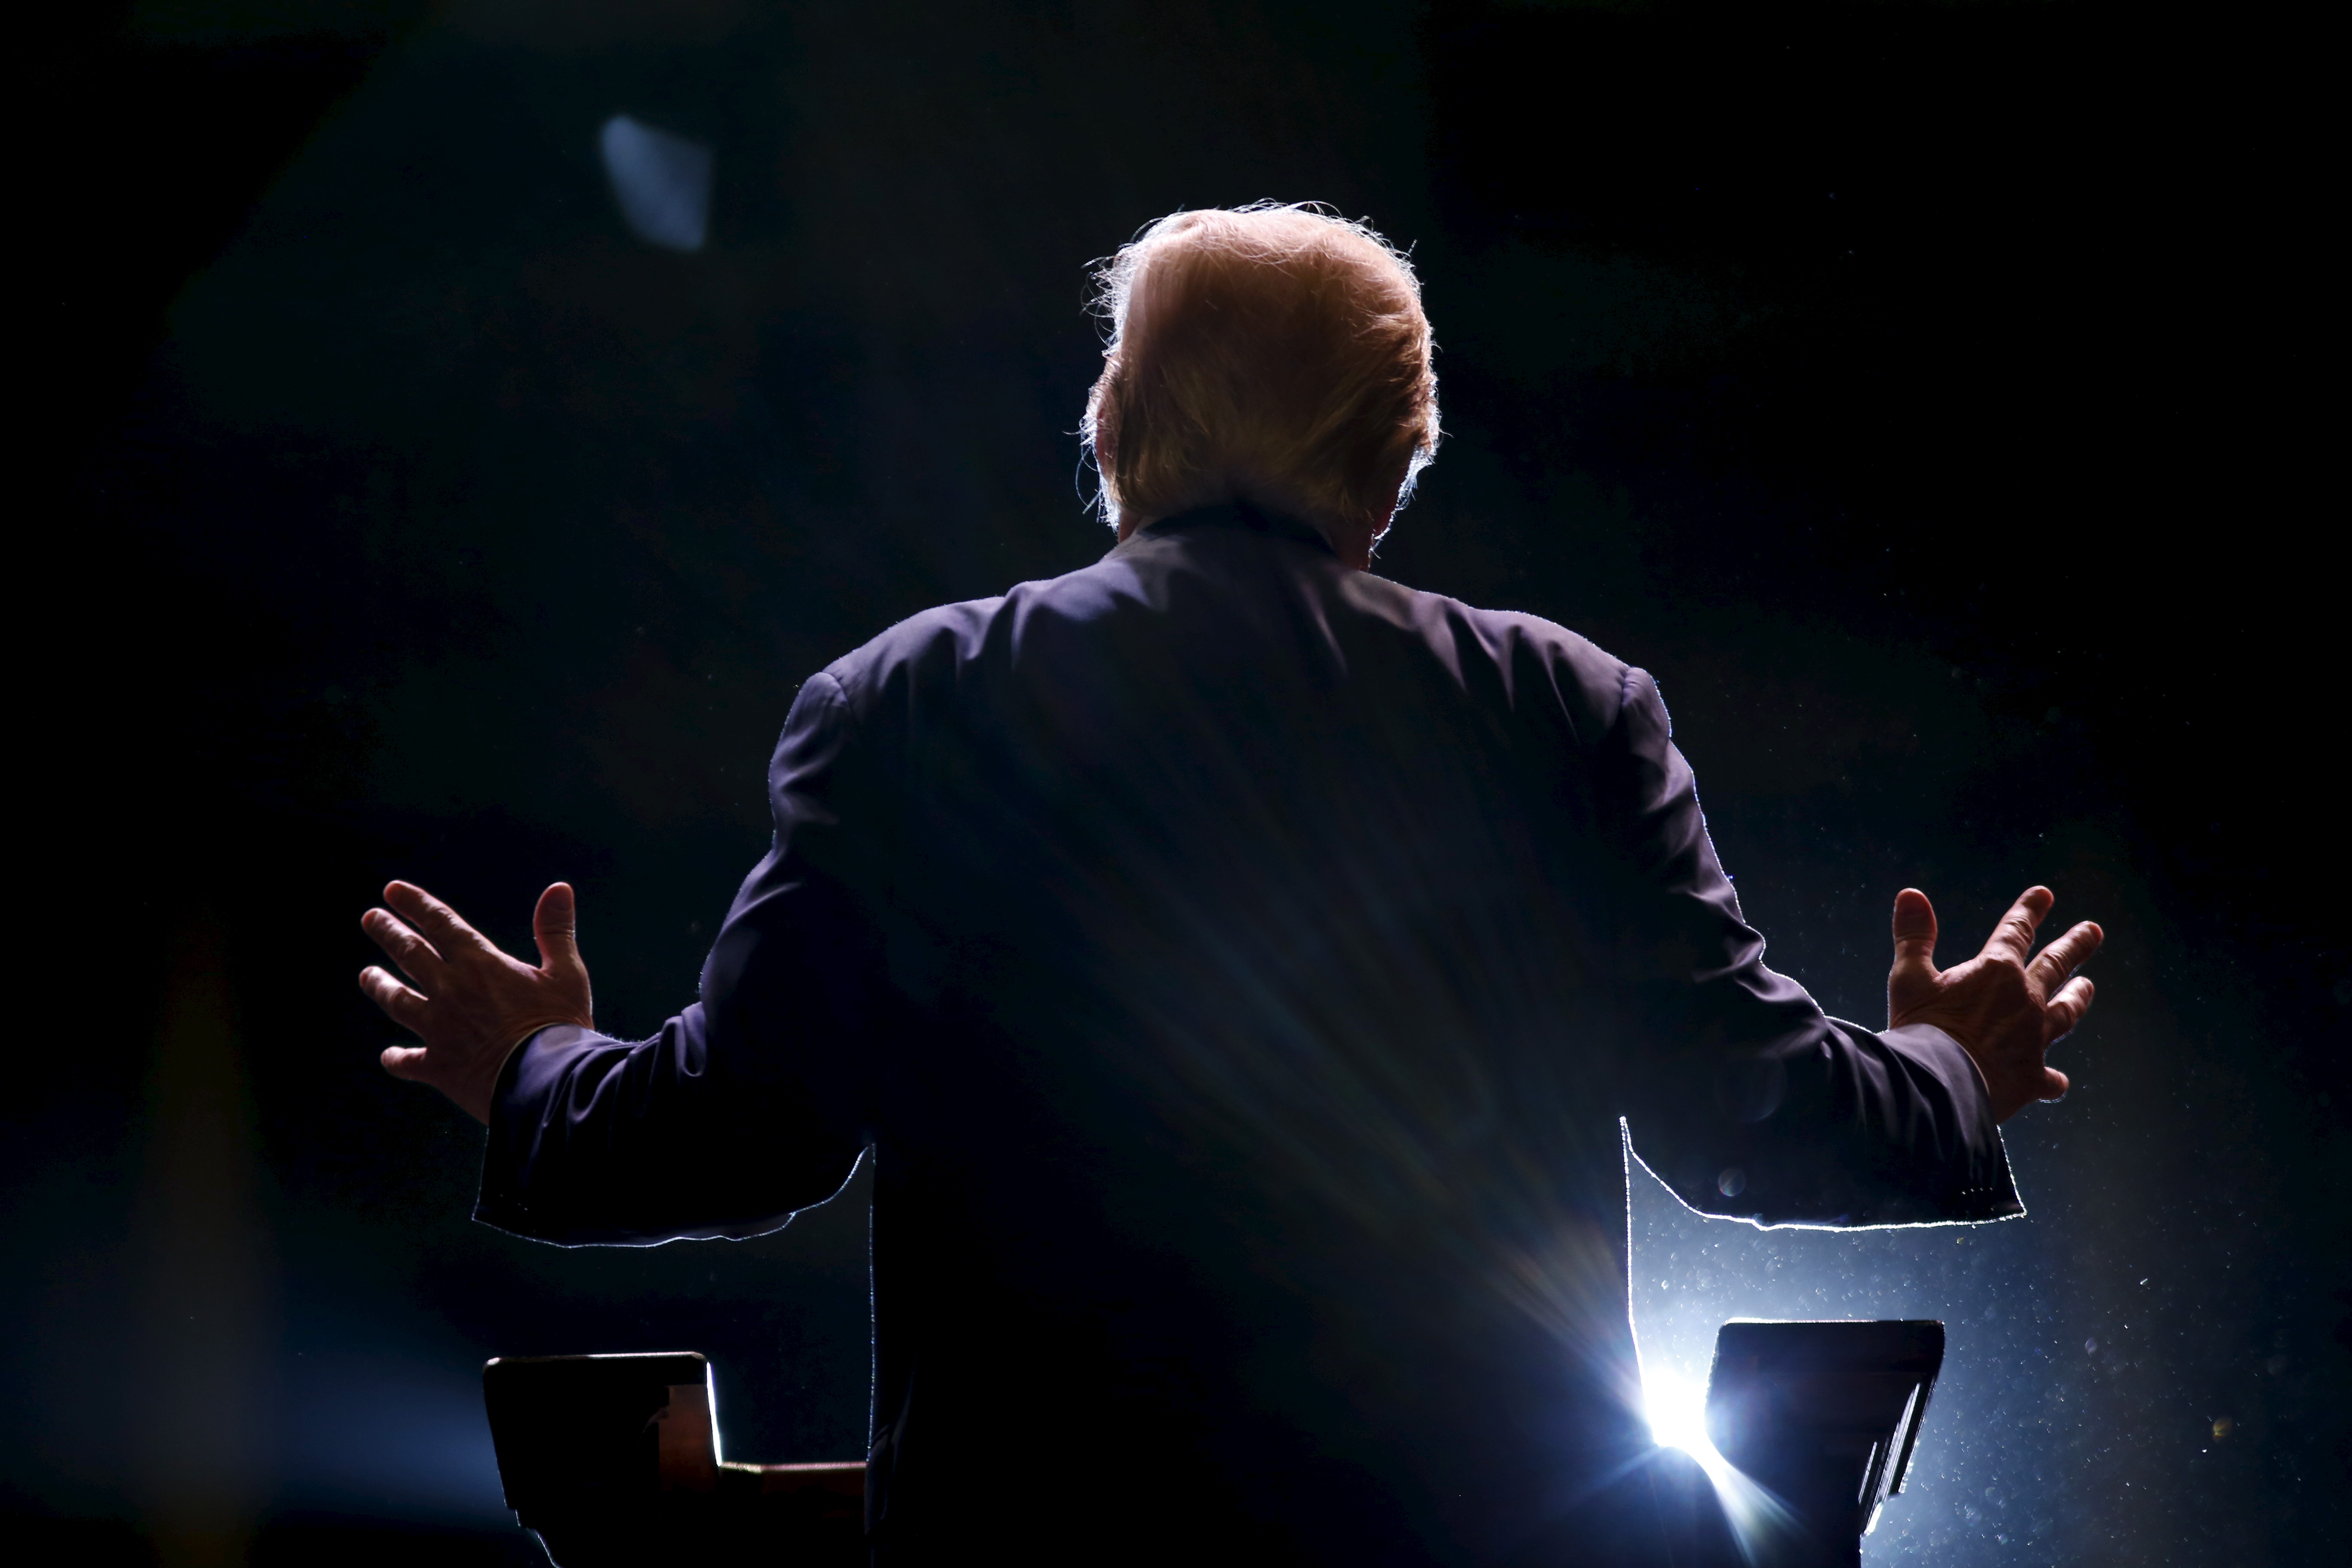 Donald Trump addresses a Trump for President campaign rally in Macon, Georgia Nov. 30, 2015.